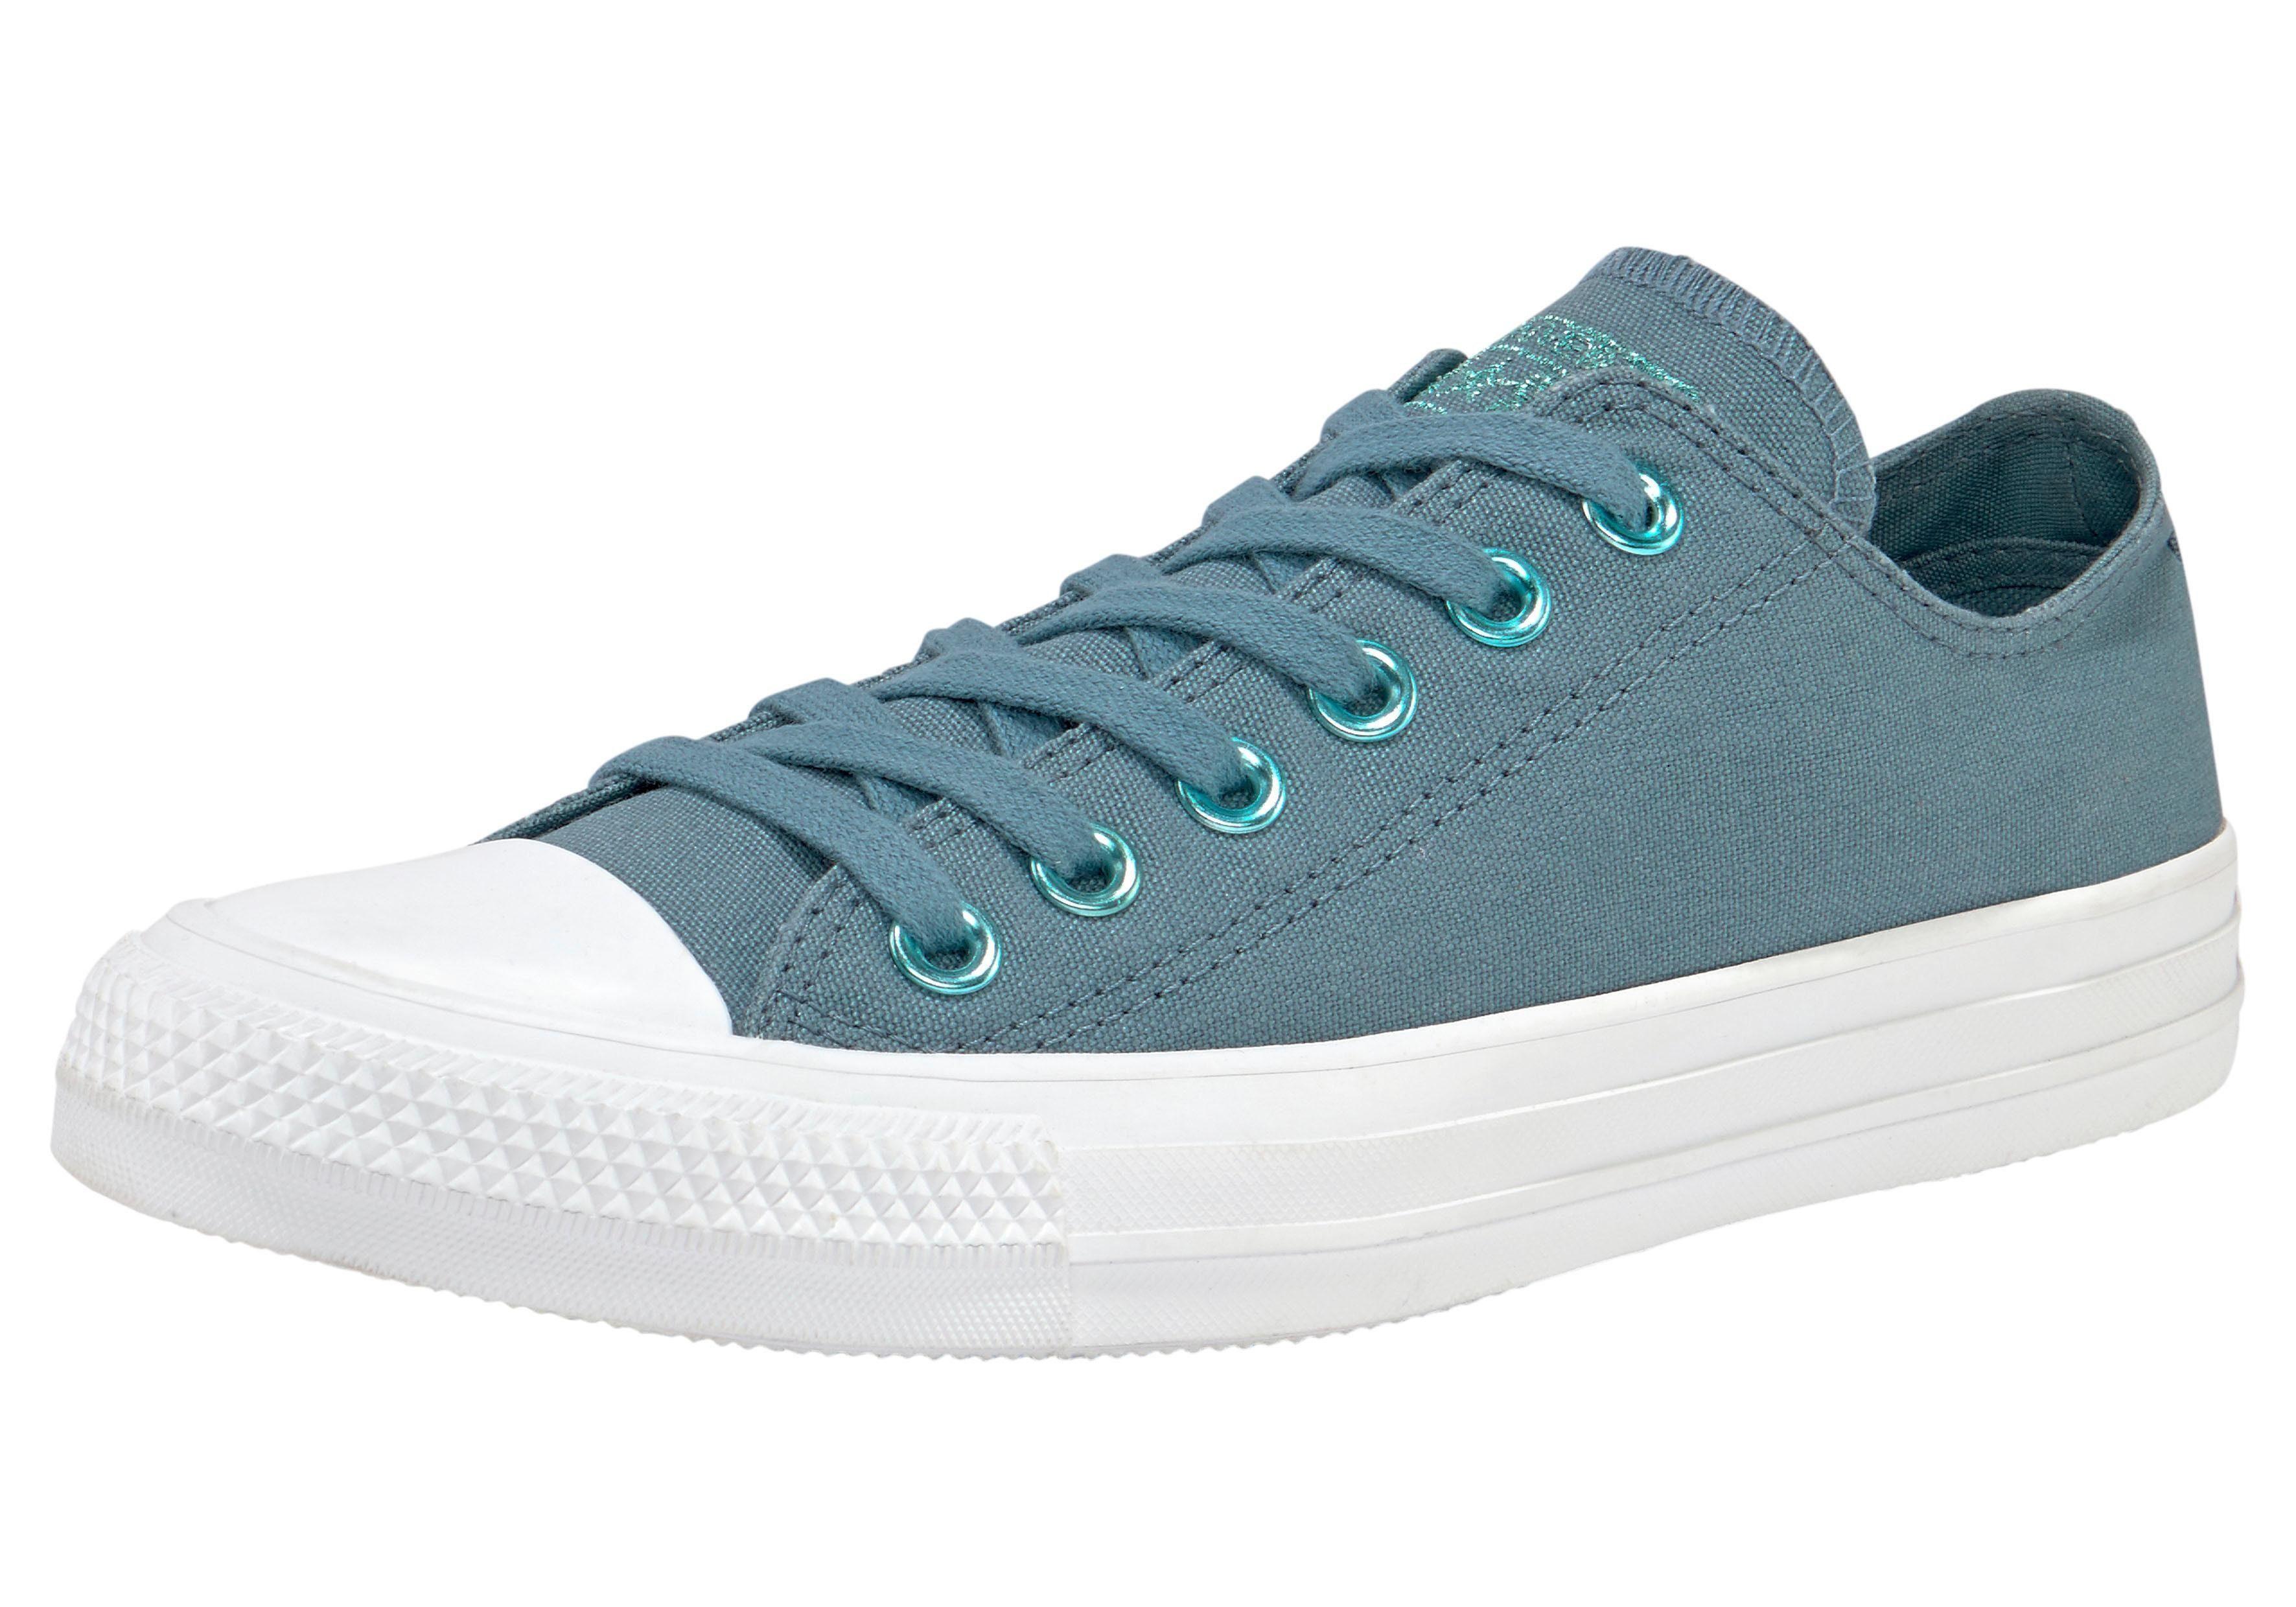 Converse »Chuck Taylor All Star Ox Seasonal« Sneaker online kaufen | OTTO